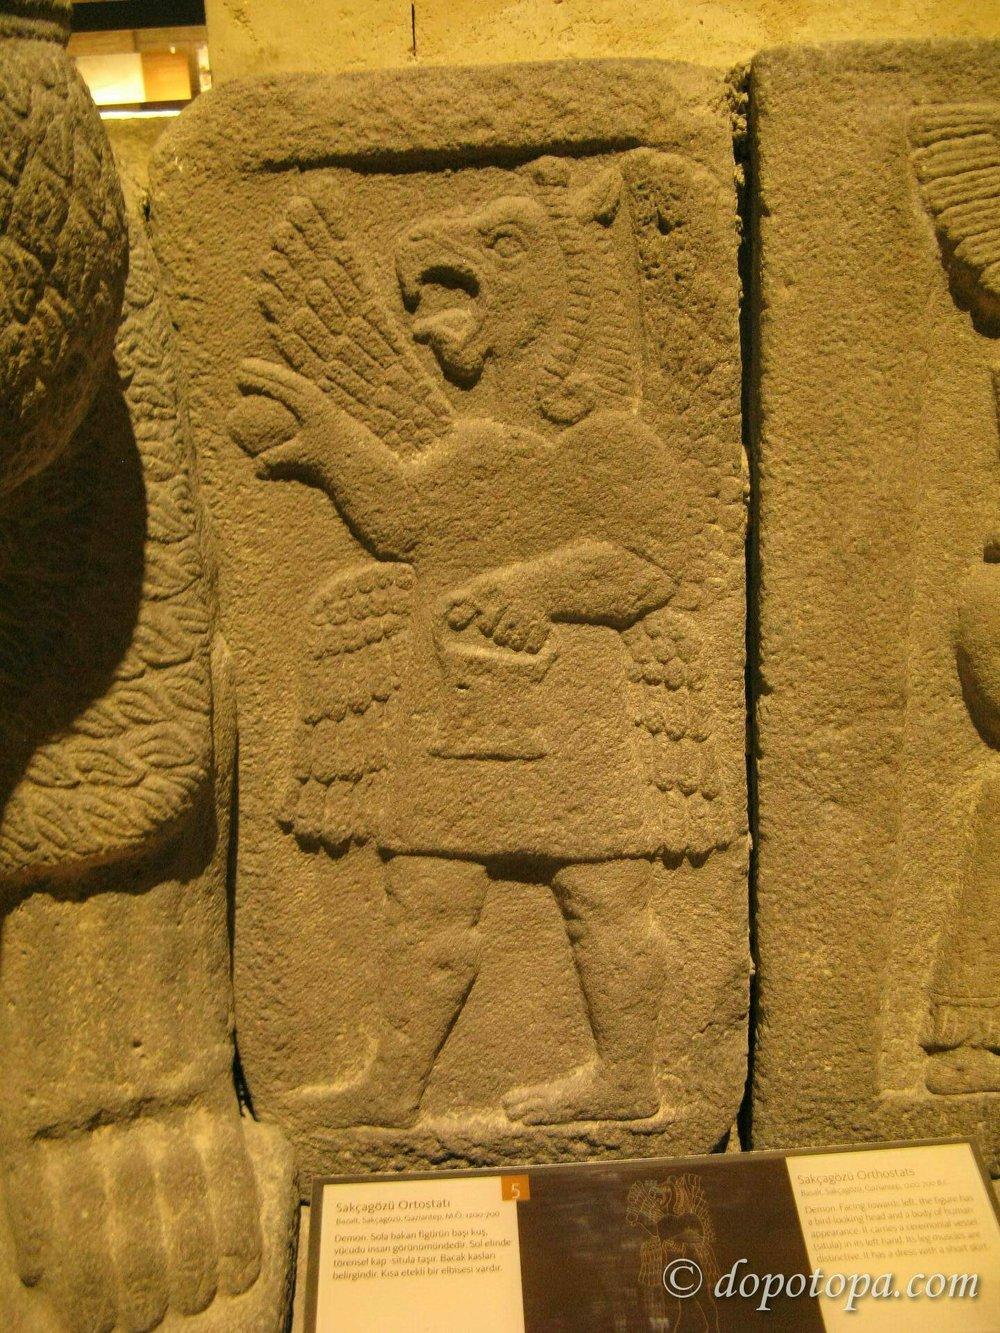 ankara_museum_stone_artefacts_27.JPG